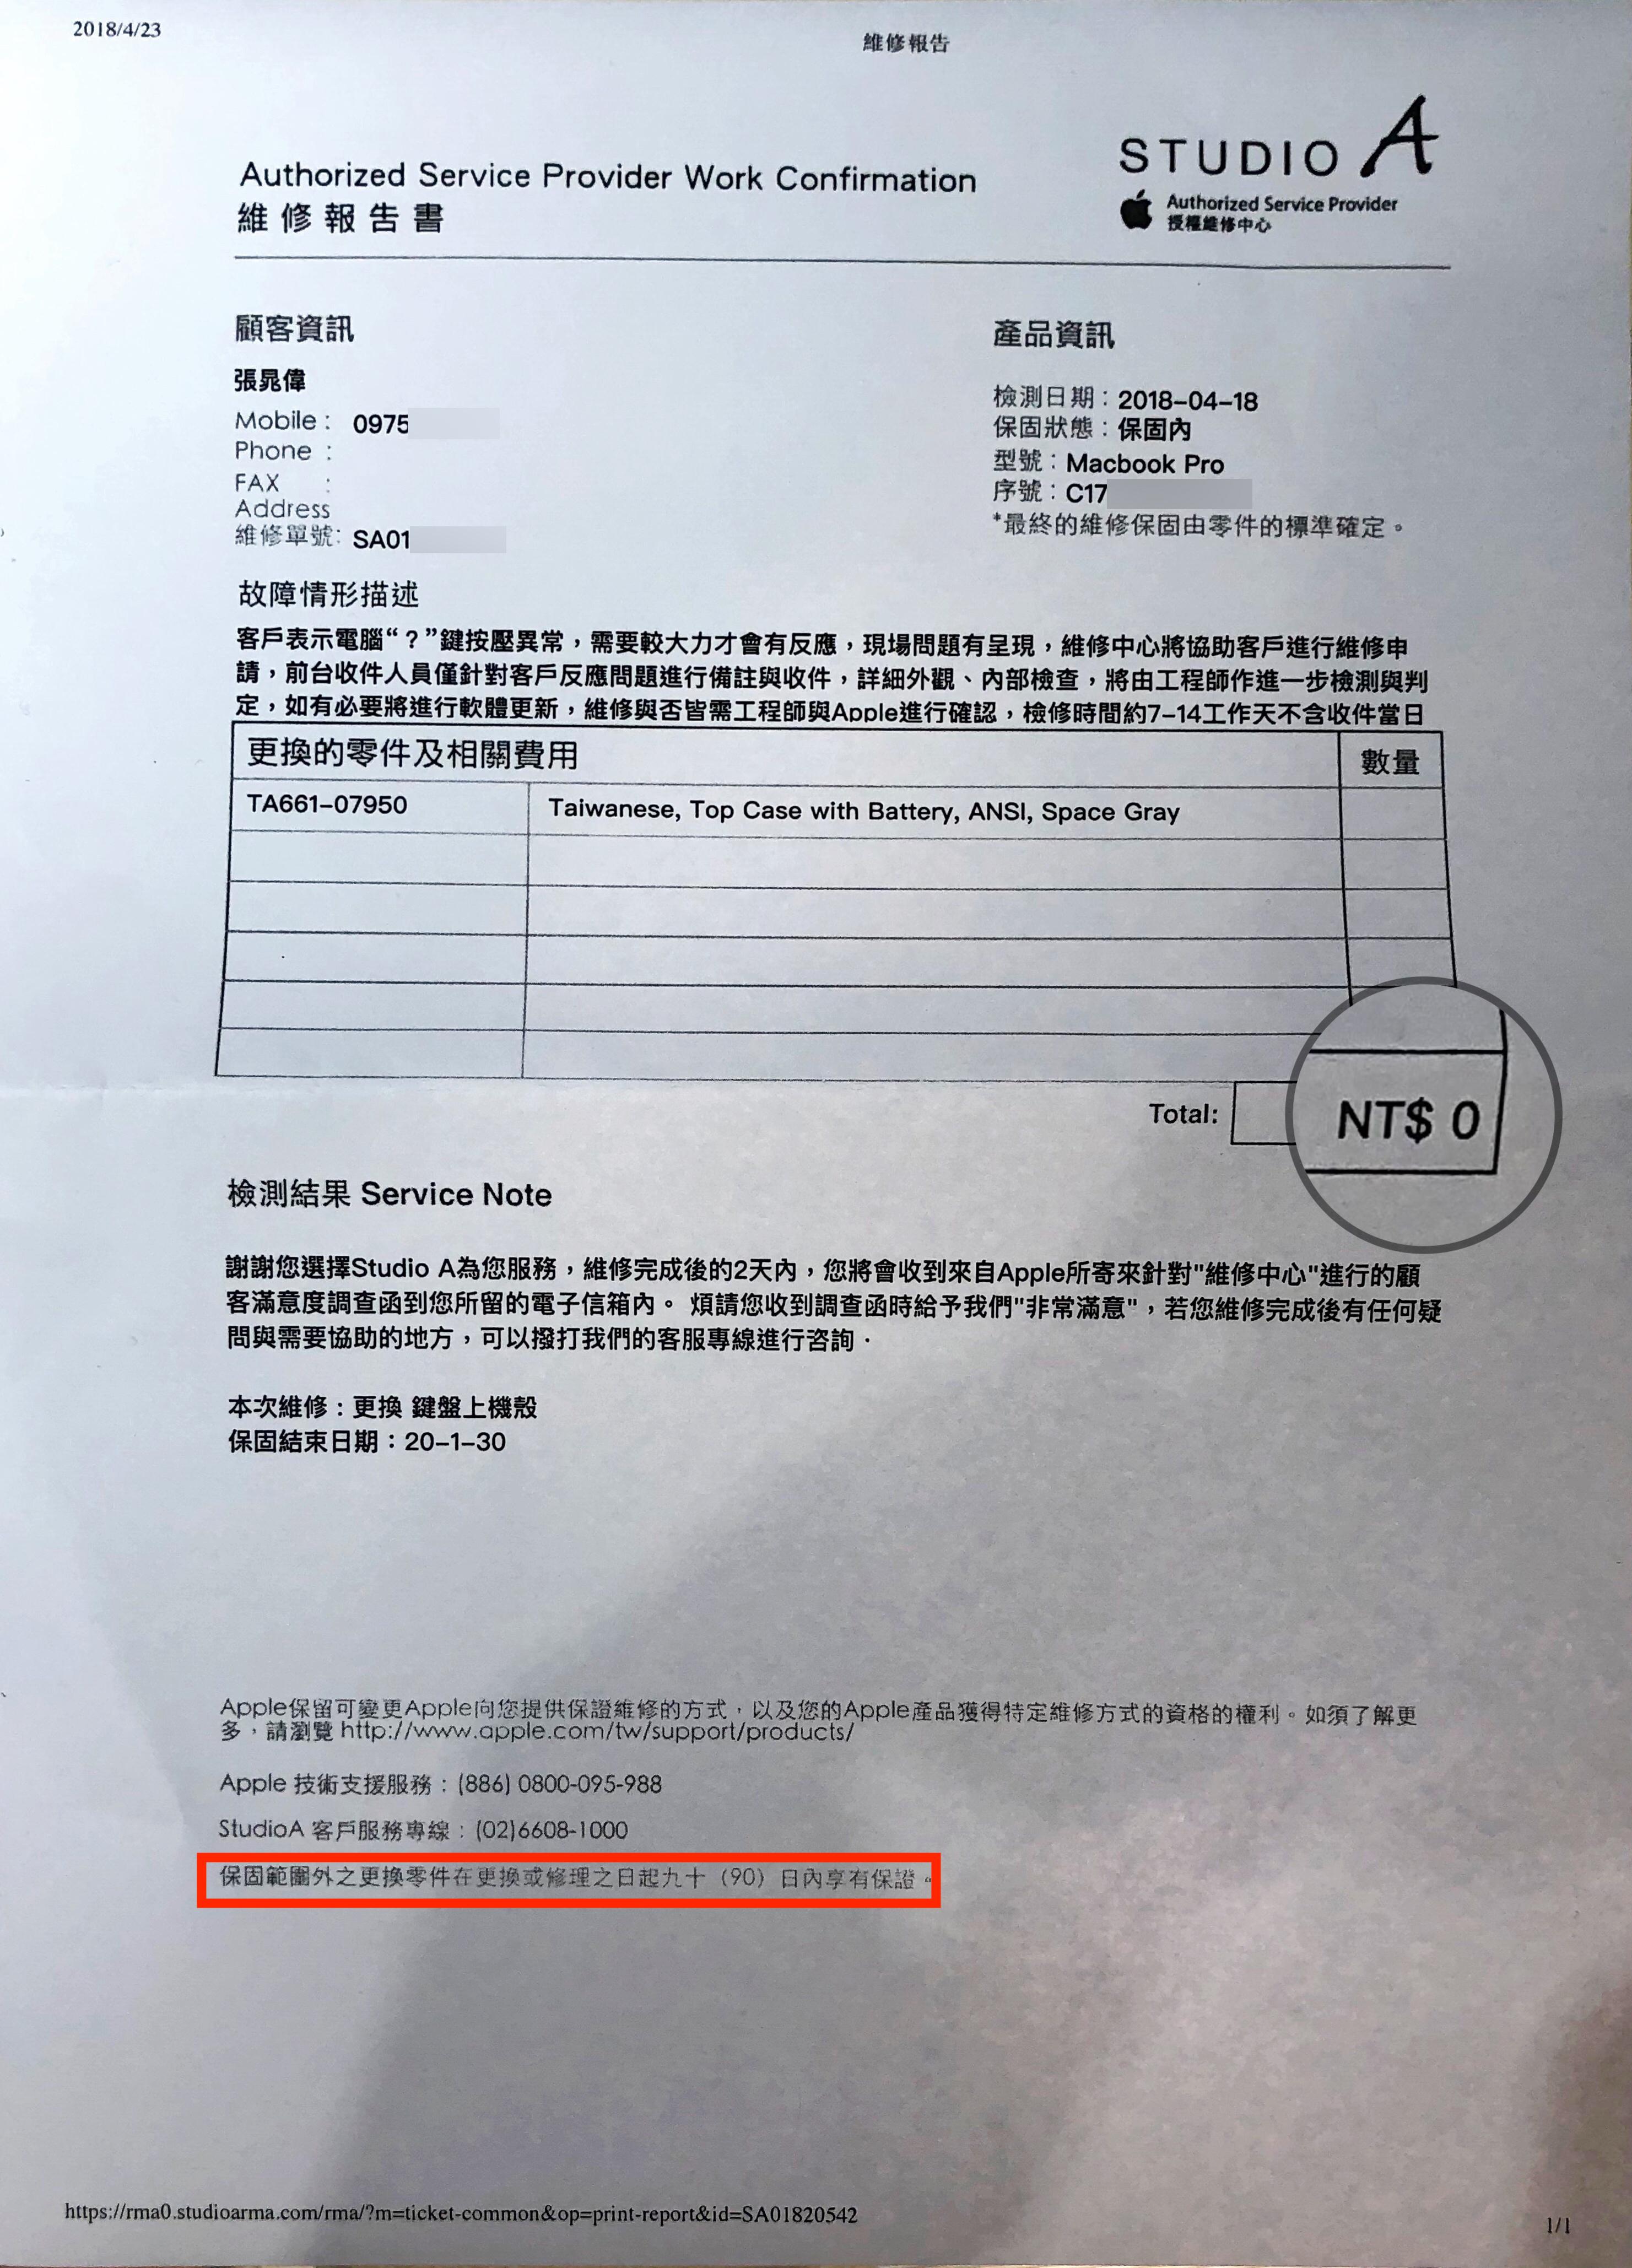 MacBook Pro 鍵盤故障送修過程-維修報告書